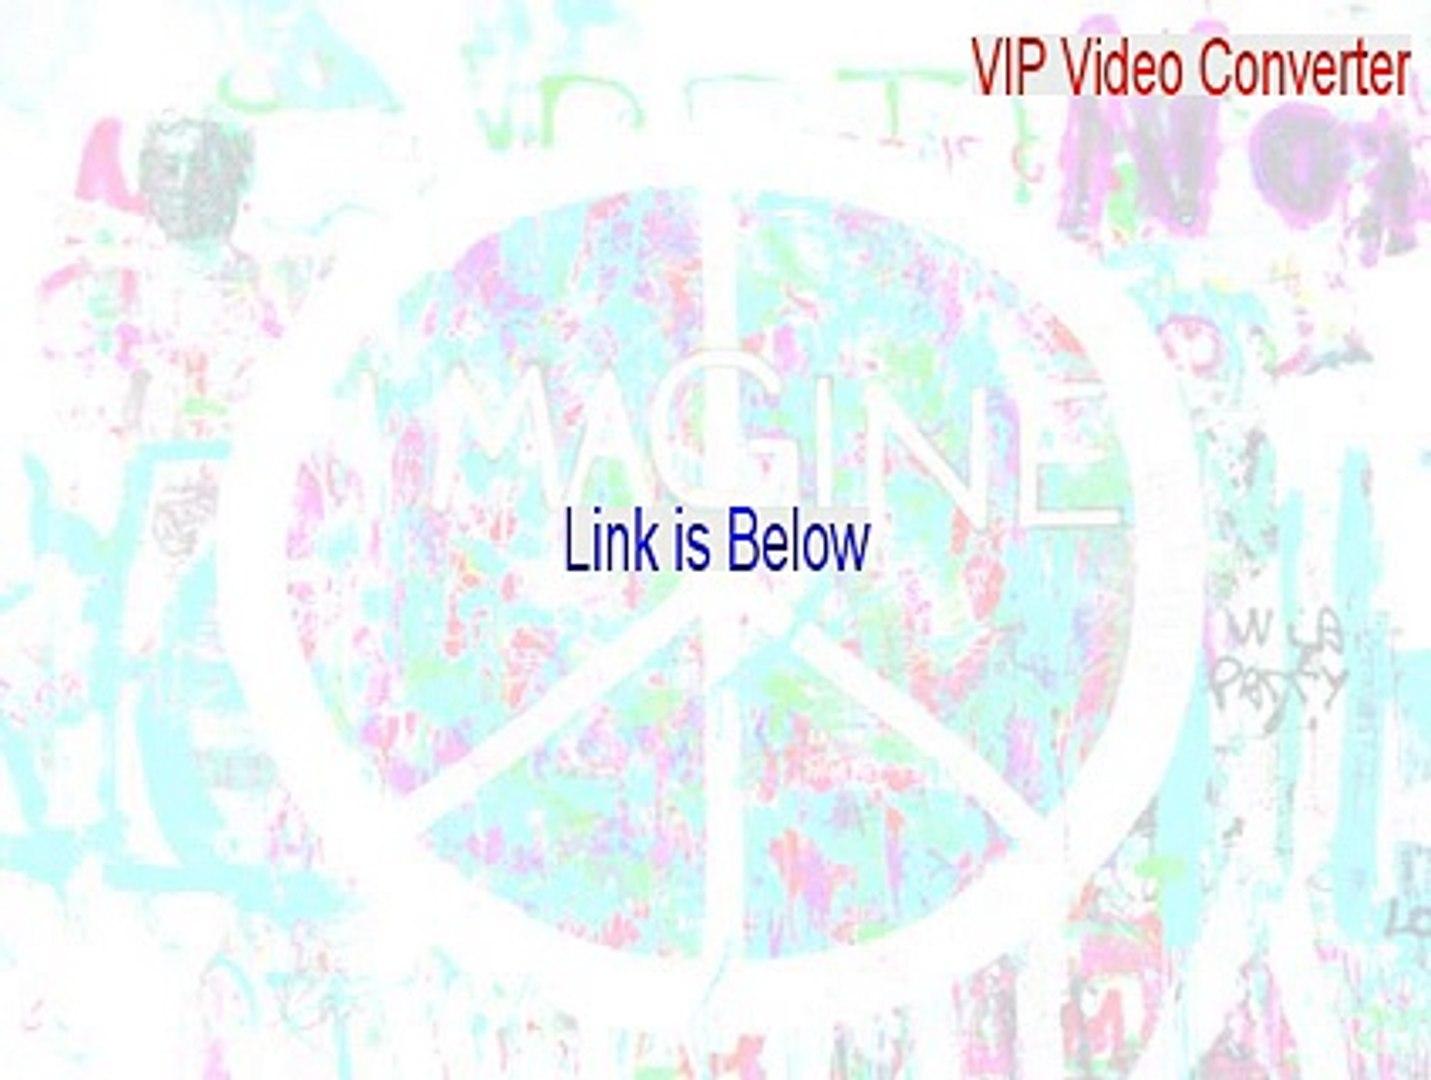 vip video converter crack download